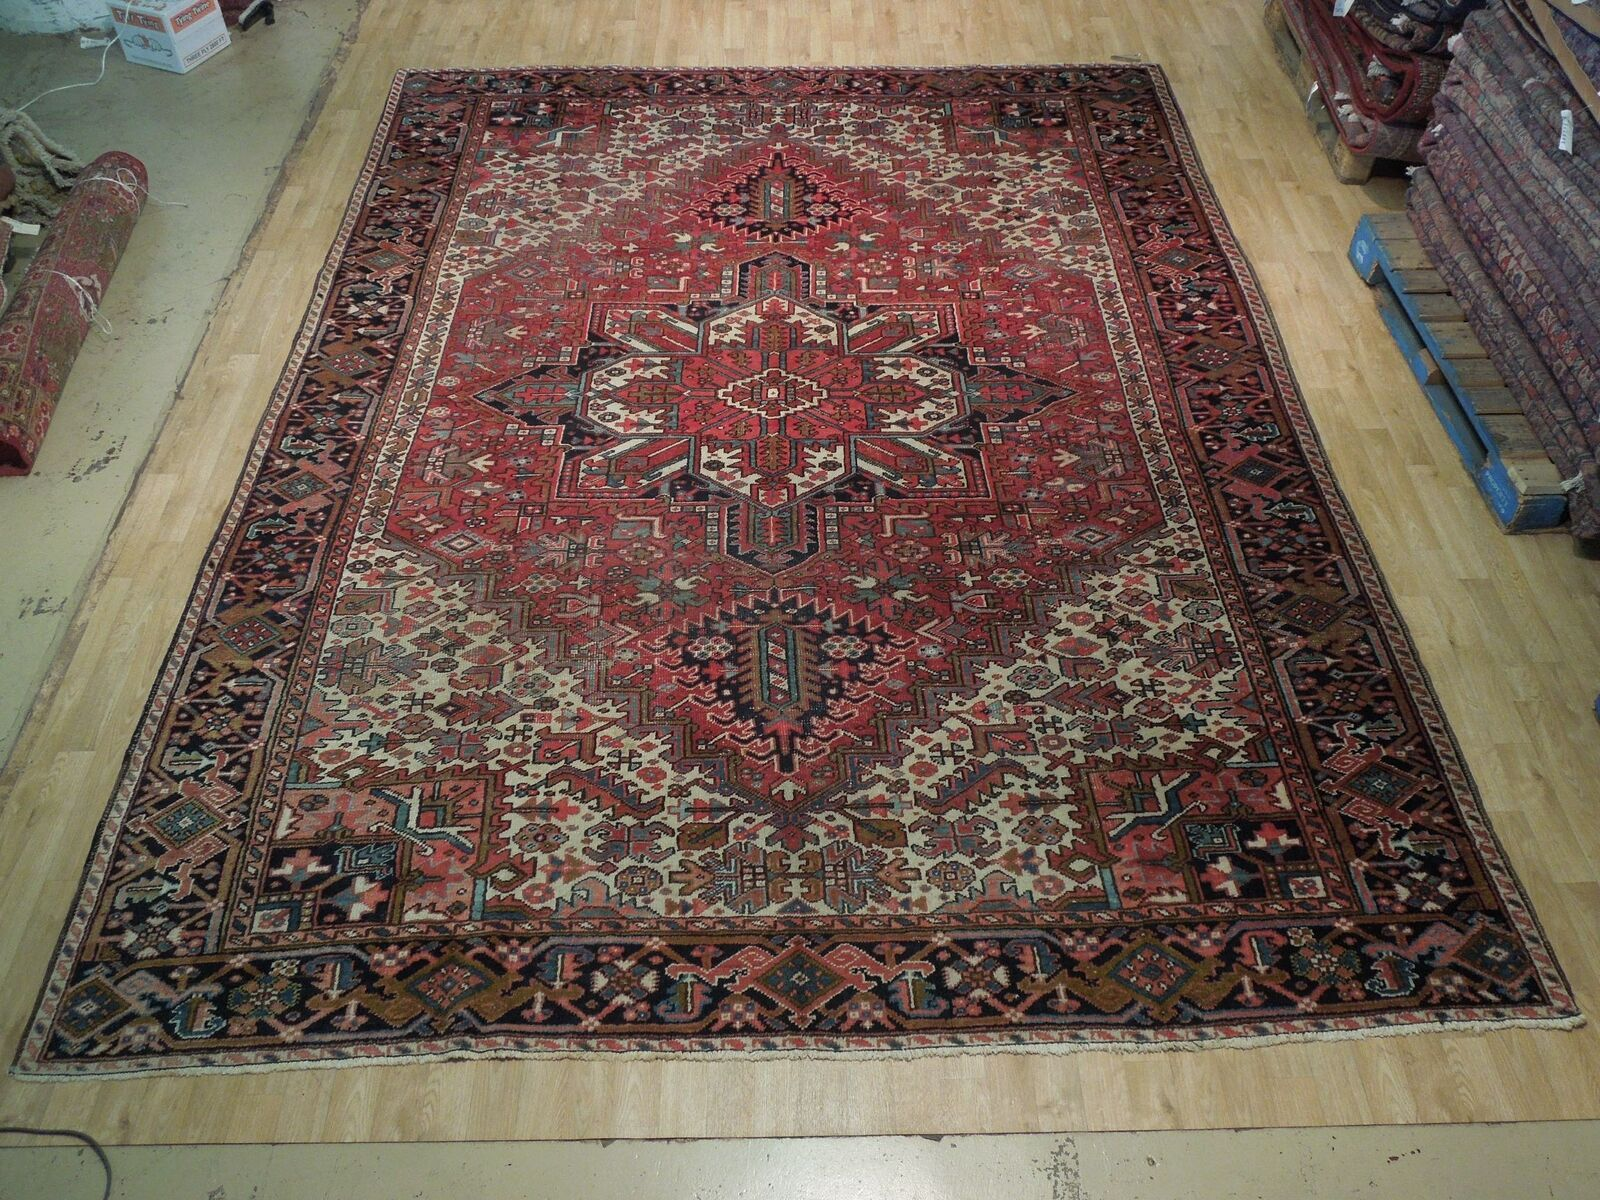 Normal Wear Semi-Antique Persian Handmade 9x12 Burgundy Heriz Wool Rug image 4